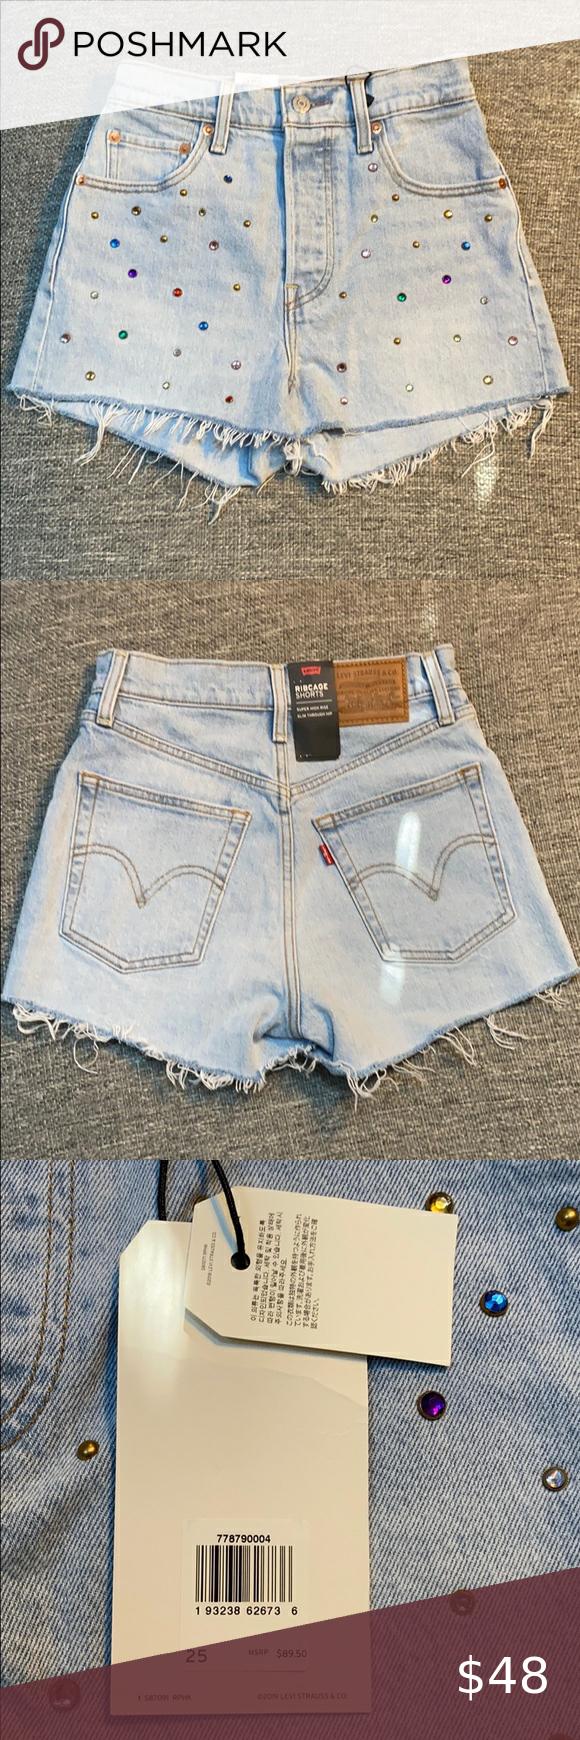 Vintage Lilly Pulitzer shorts women frayed denim jeans shorts size 4